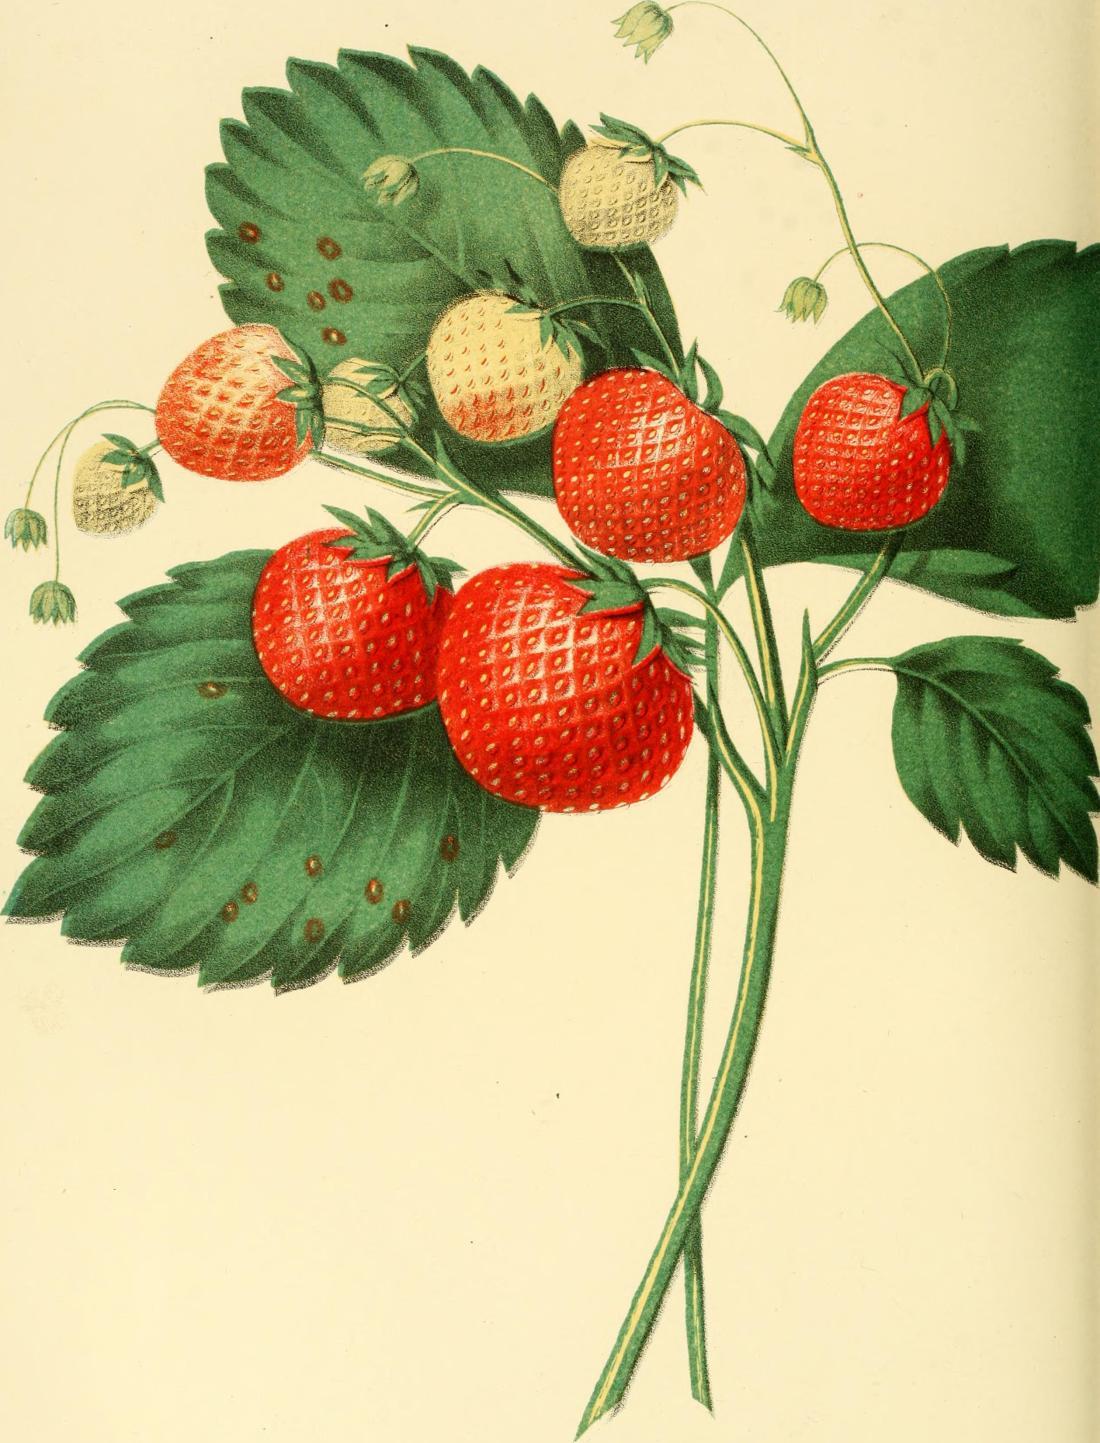 Boston Pine strawberry